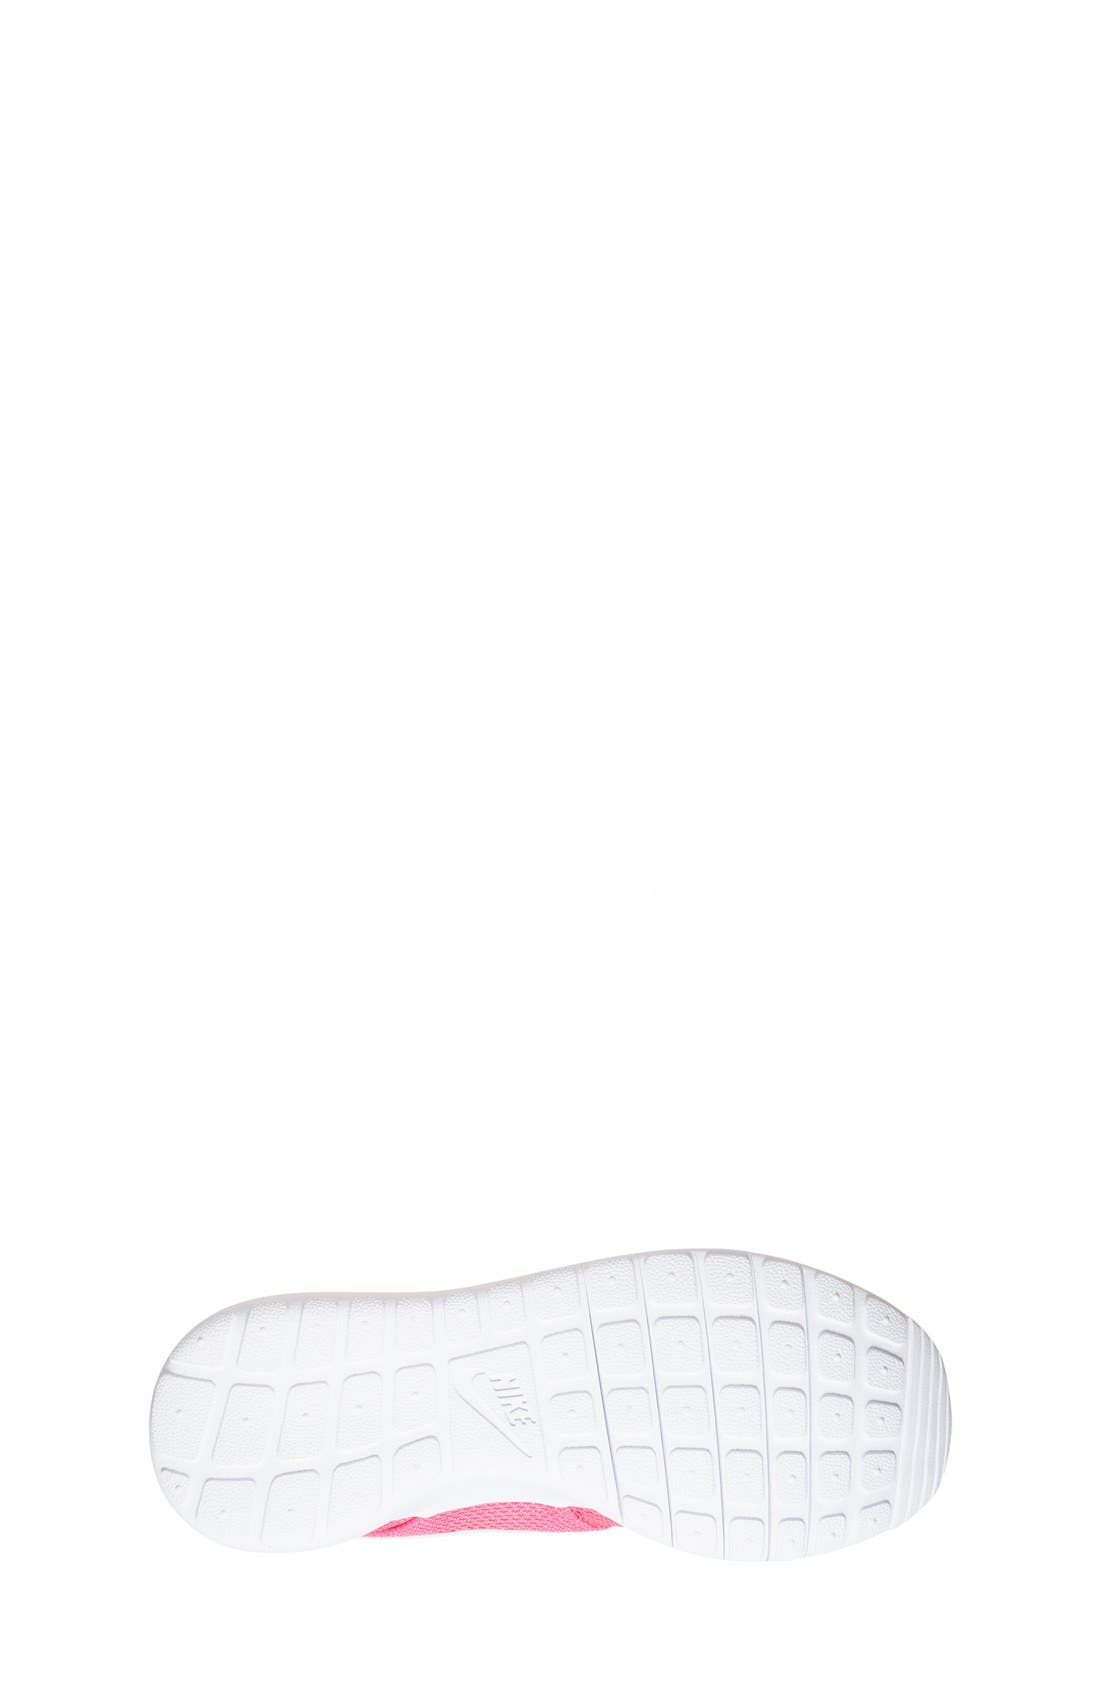 Alternate Image 3  - Nike 'Roshe Run' Athletic Shoe (Little Kid & Big Kid)